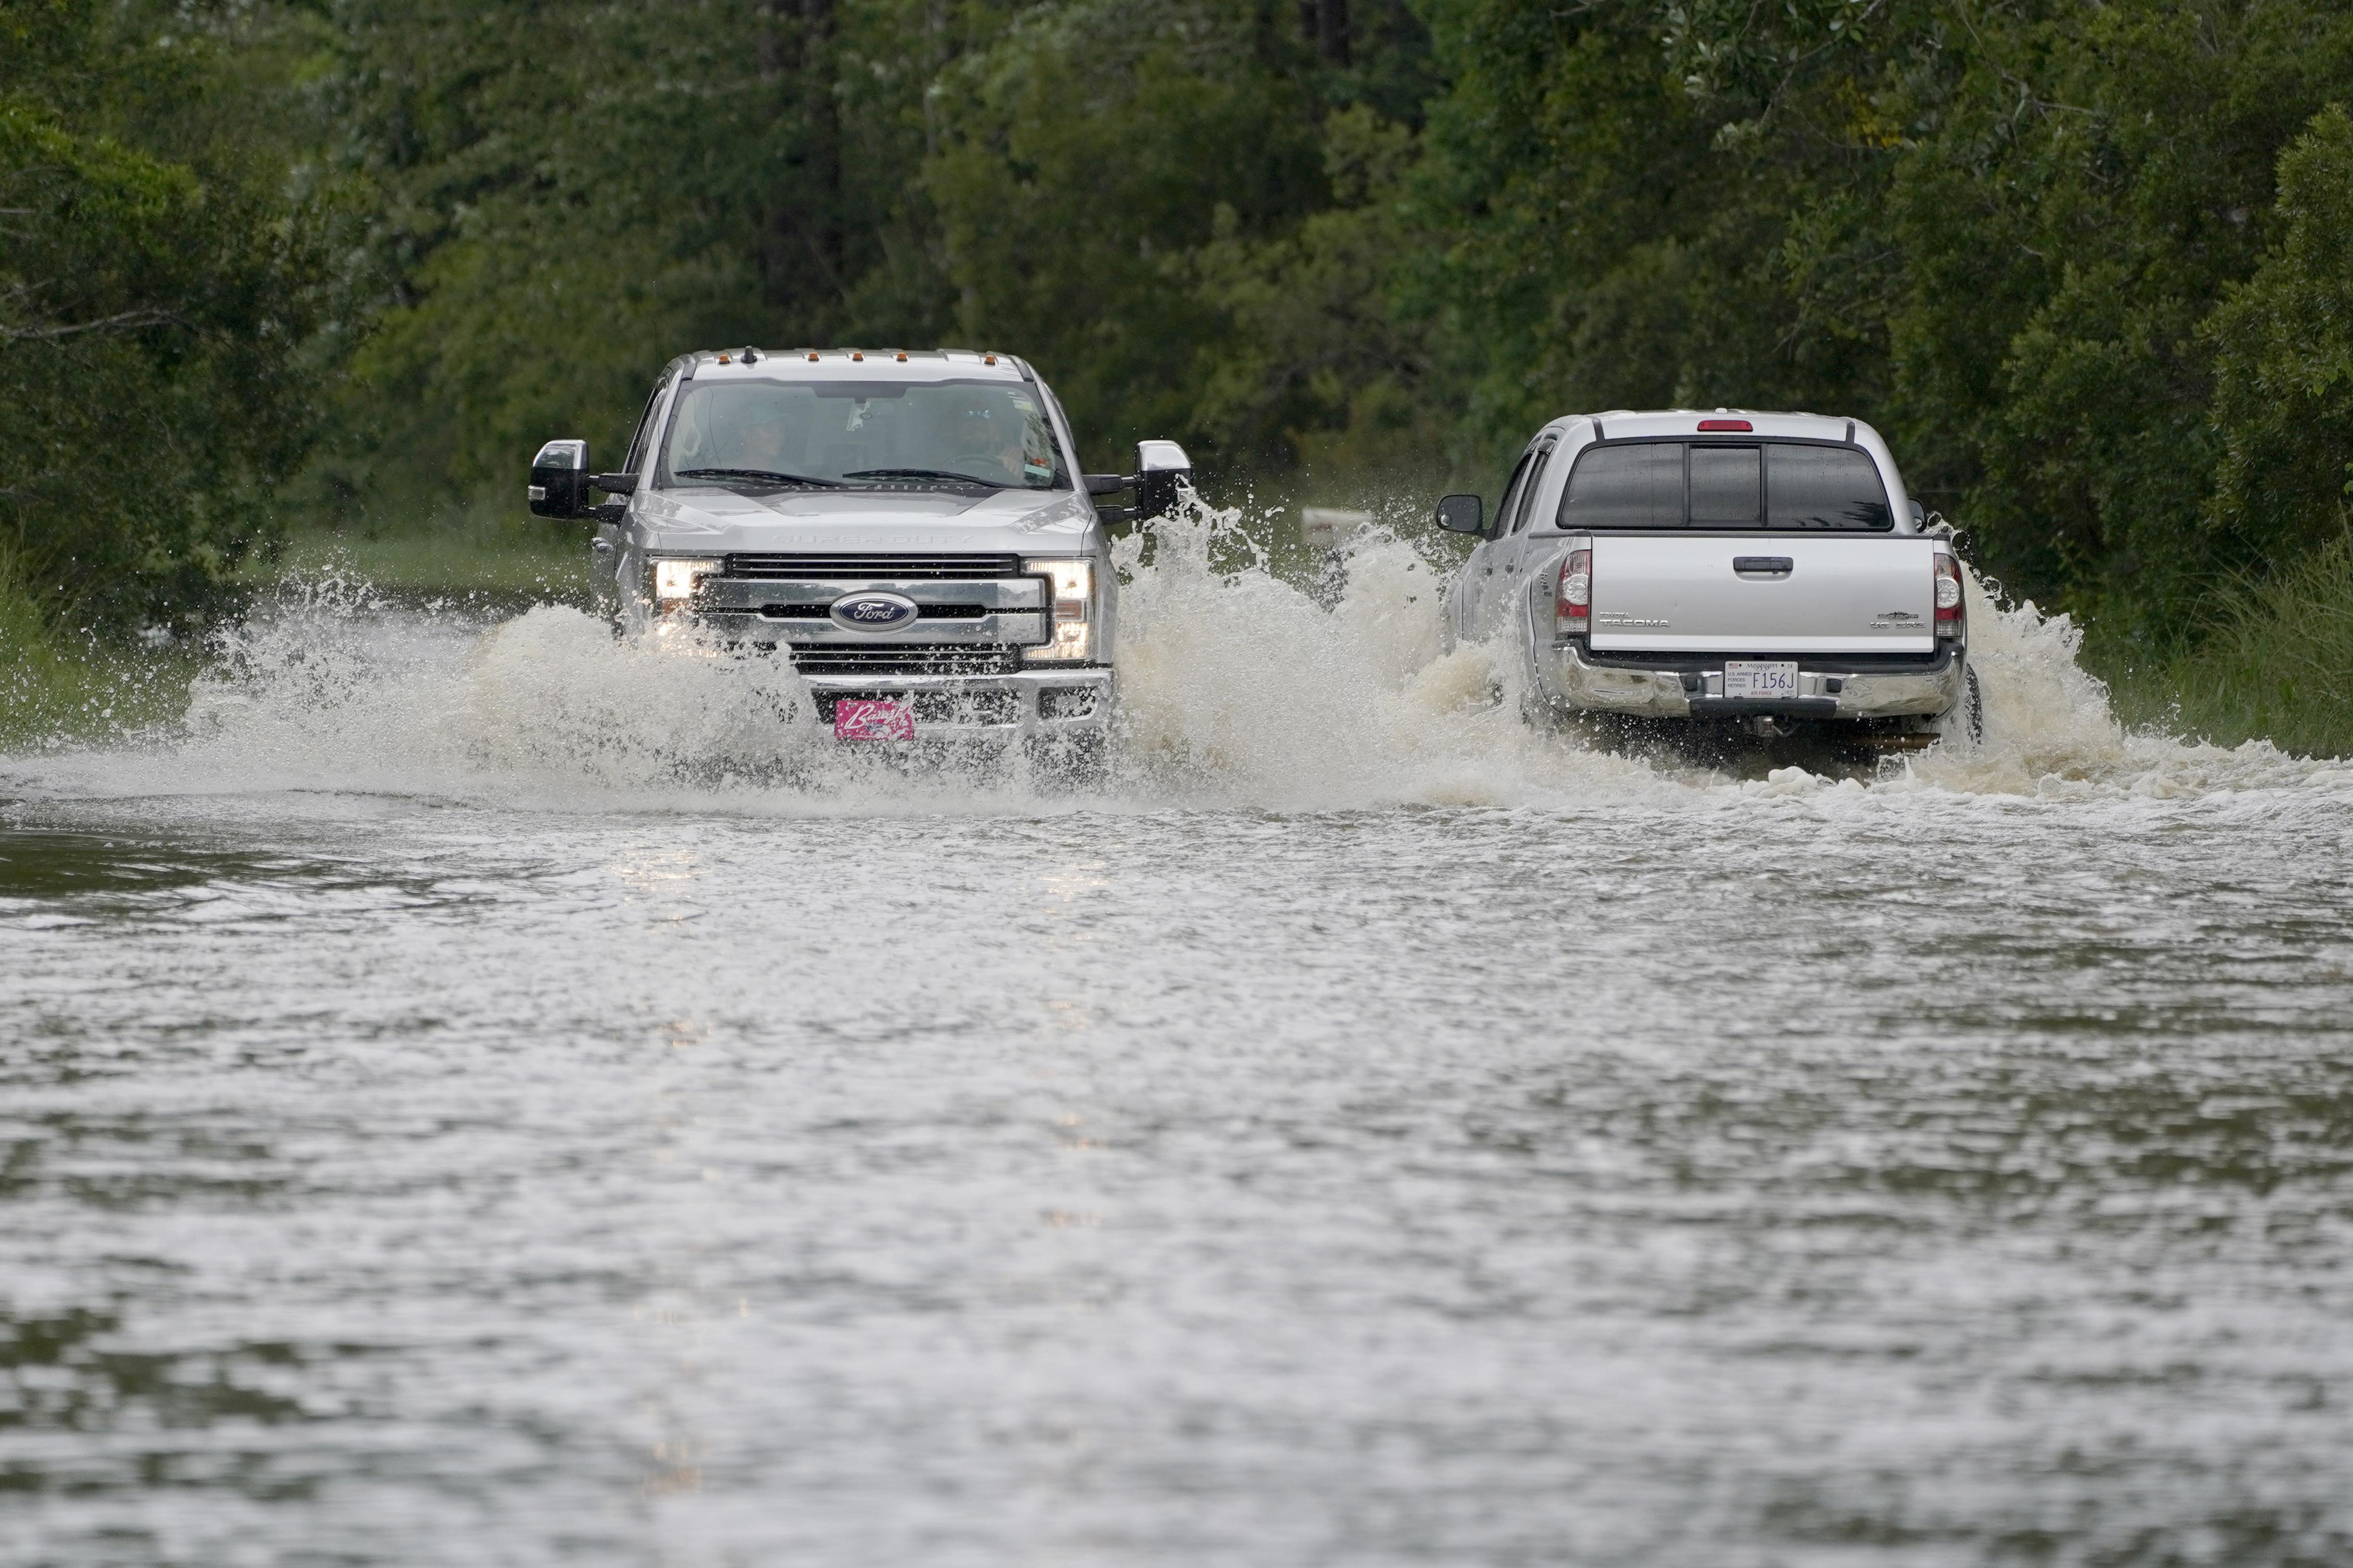 Nine children and one adult killed in Alabama crash during storm